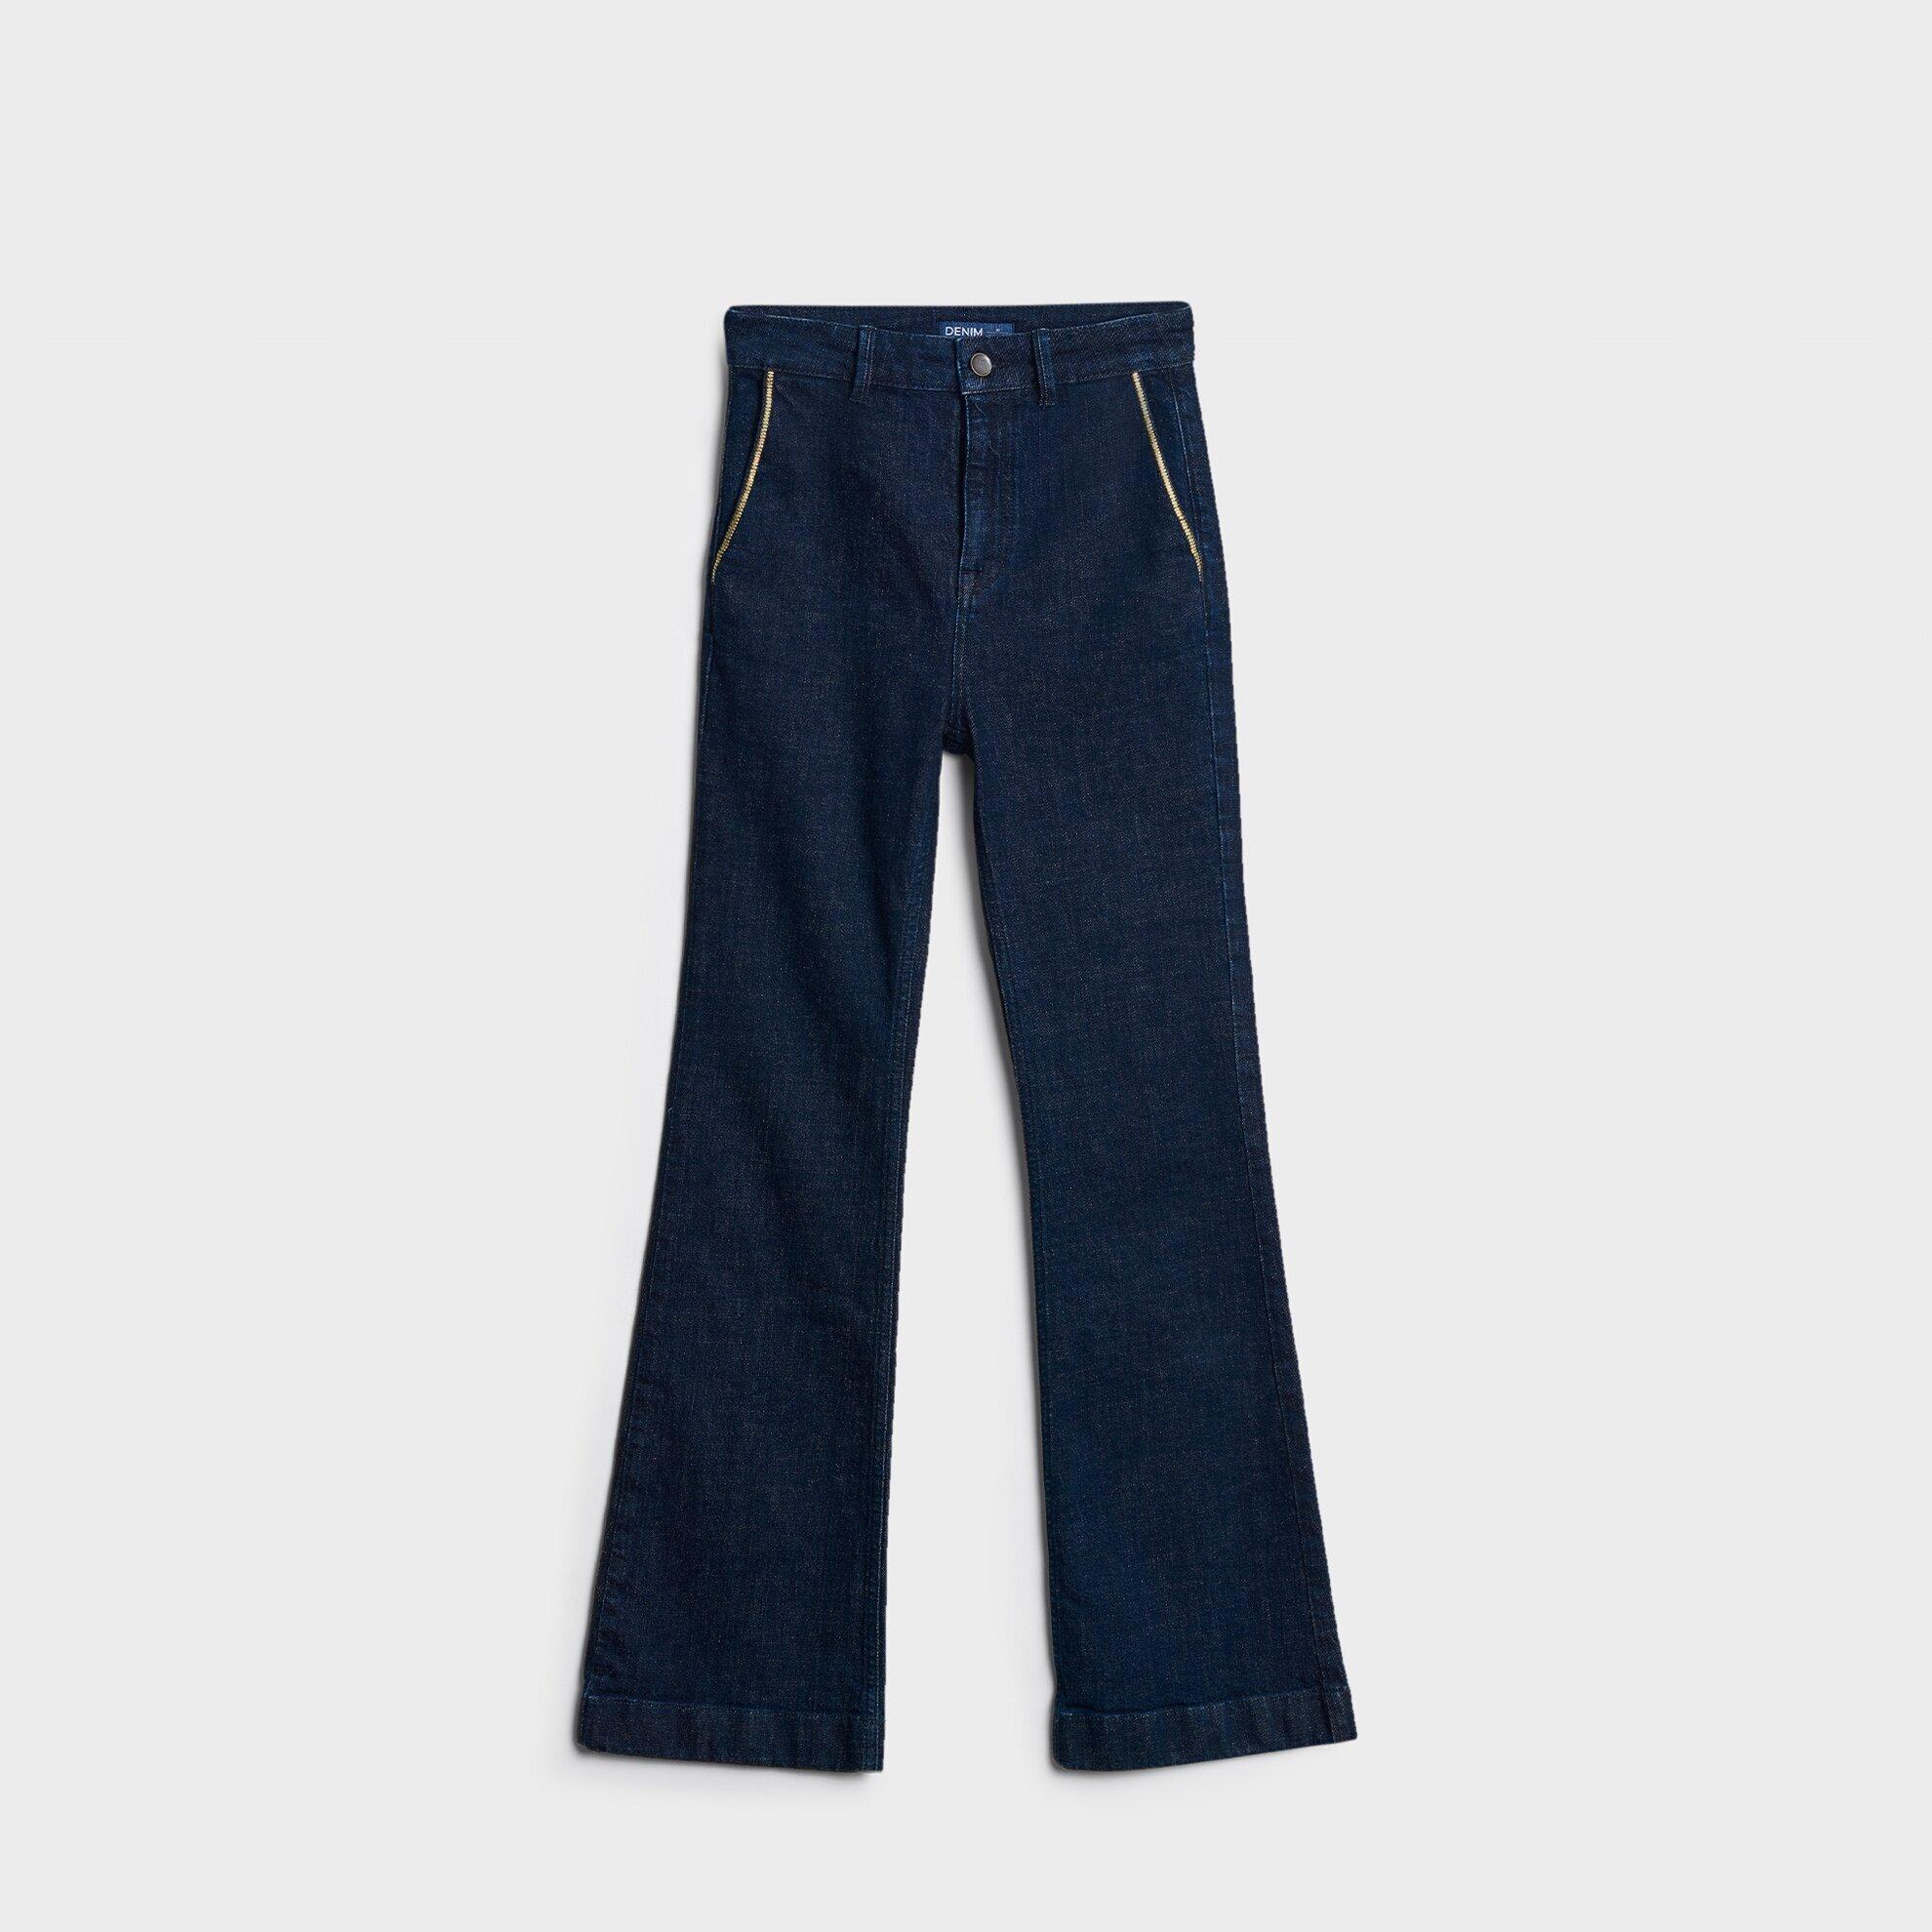 Geniş Paçalı Denim Pantolon